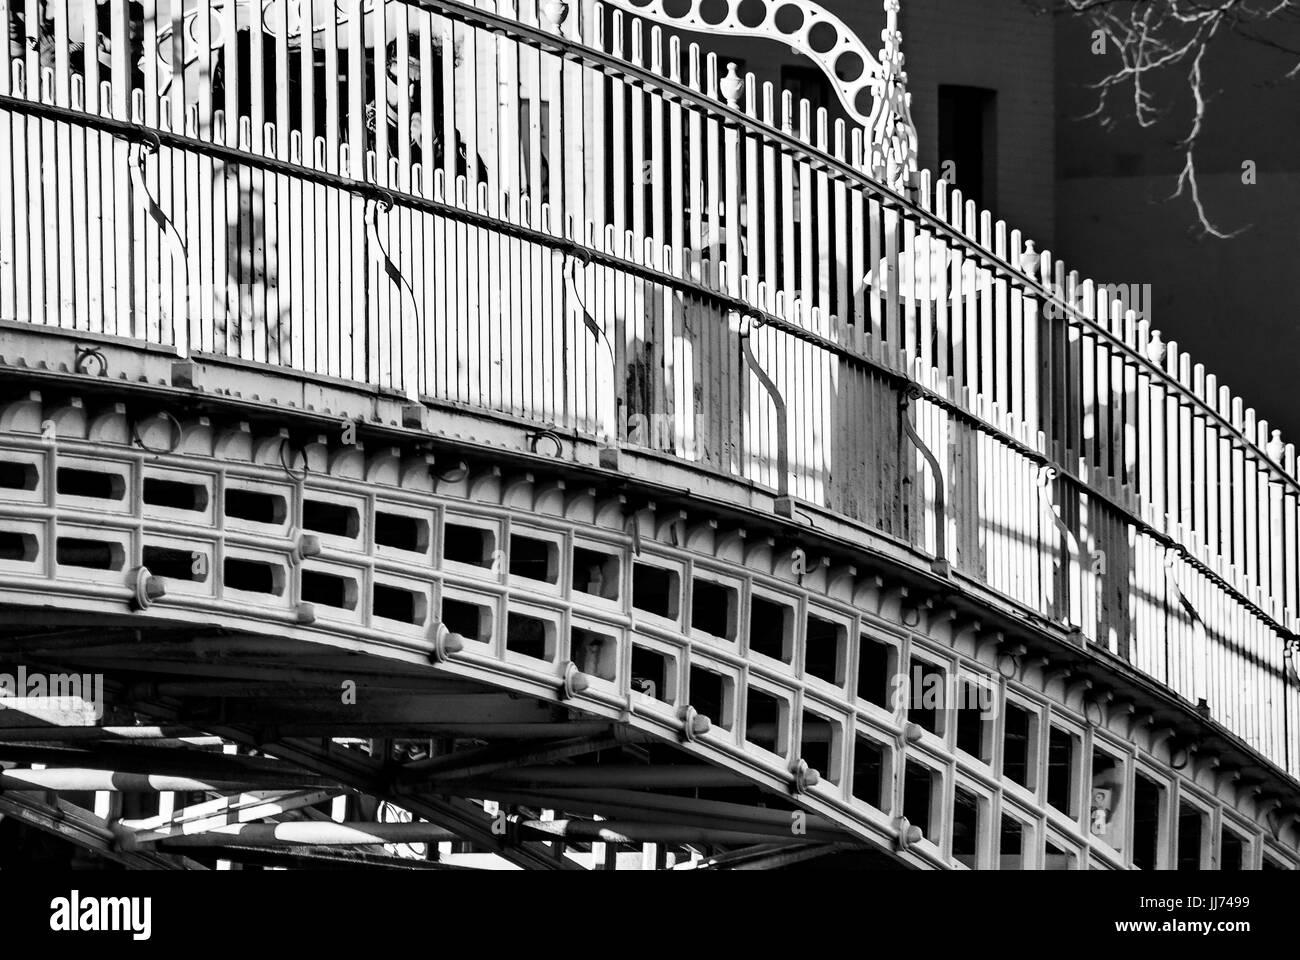 Dublin City, Ireland, Ha' Penny bridge on Liffey river - Stock Image